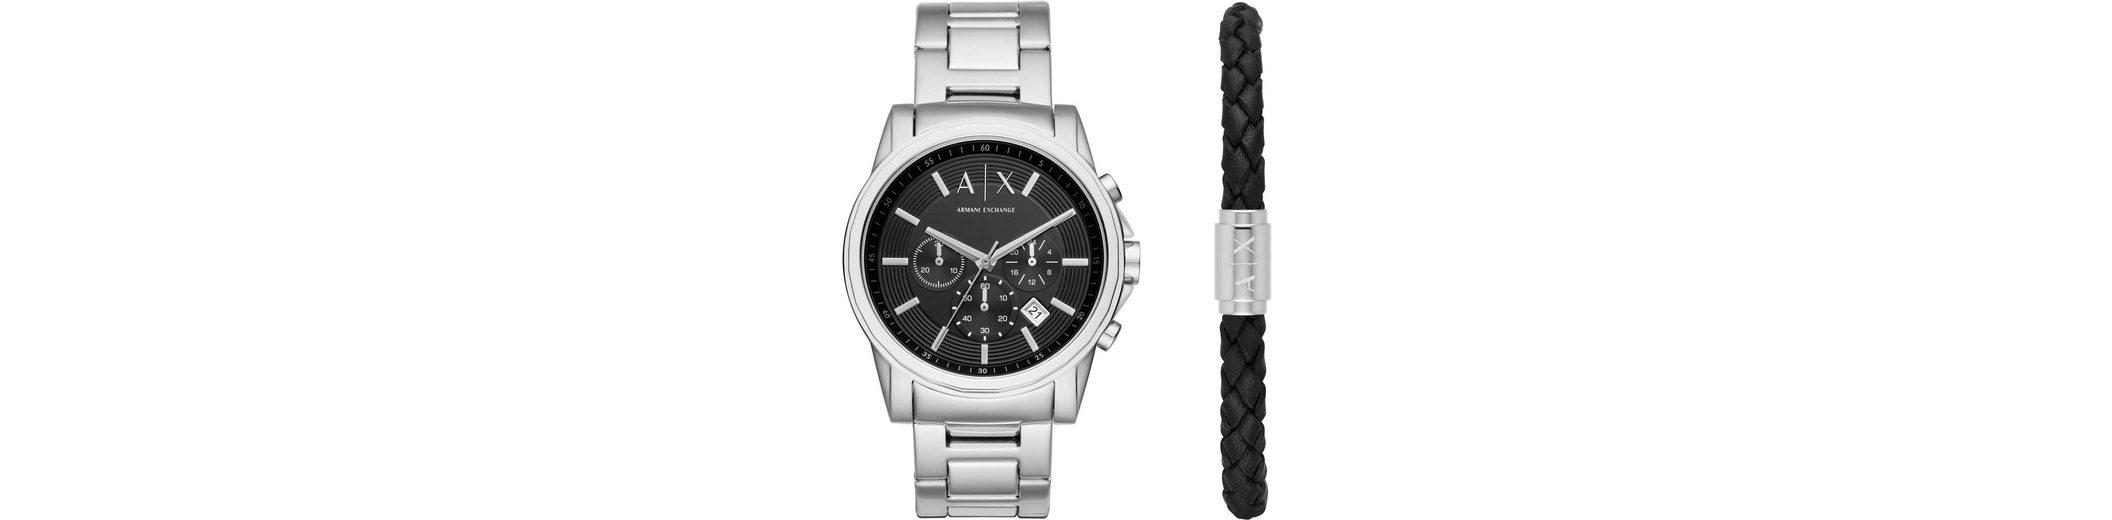 ARMANI EXCHANGE Chronograph »AX7100« mit Armband (Set, 2 tlg.)